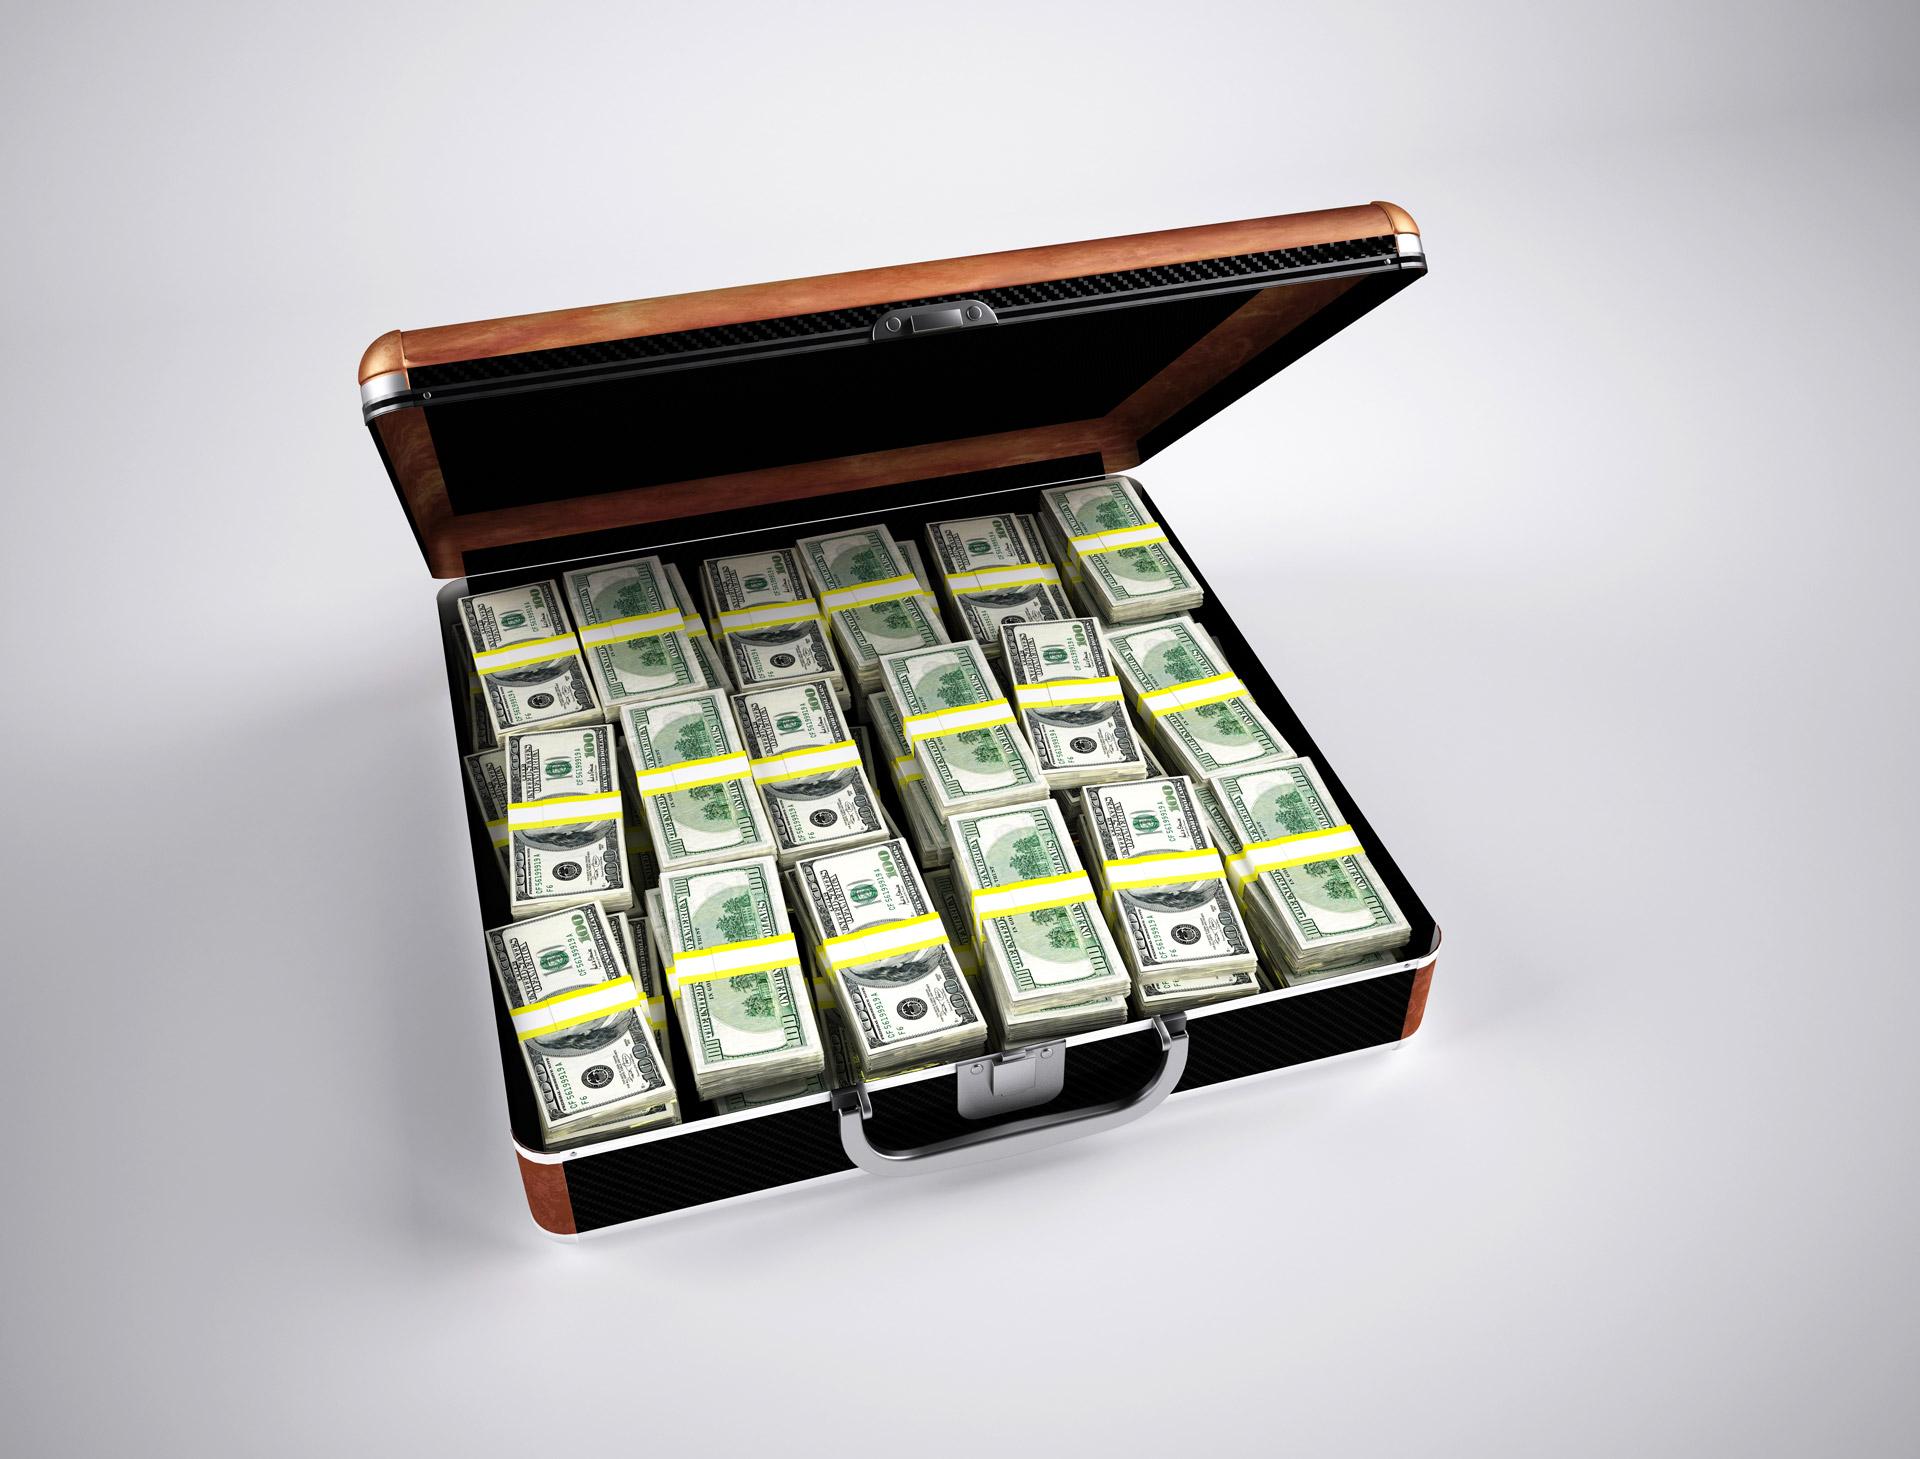 box-of-1-million-dollars